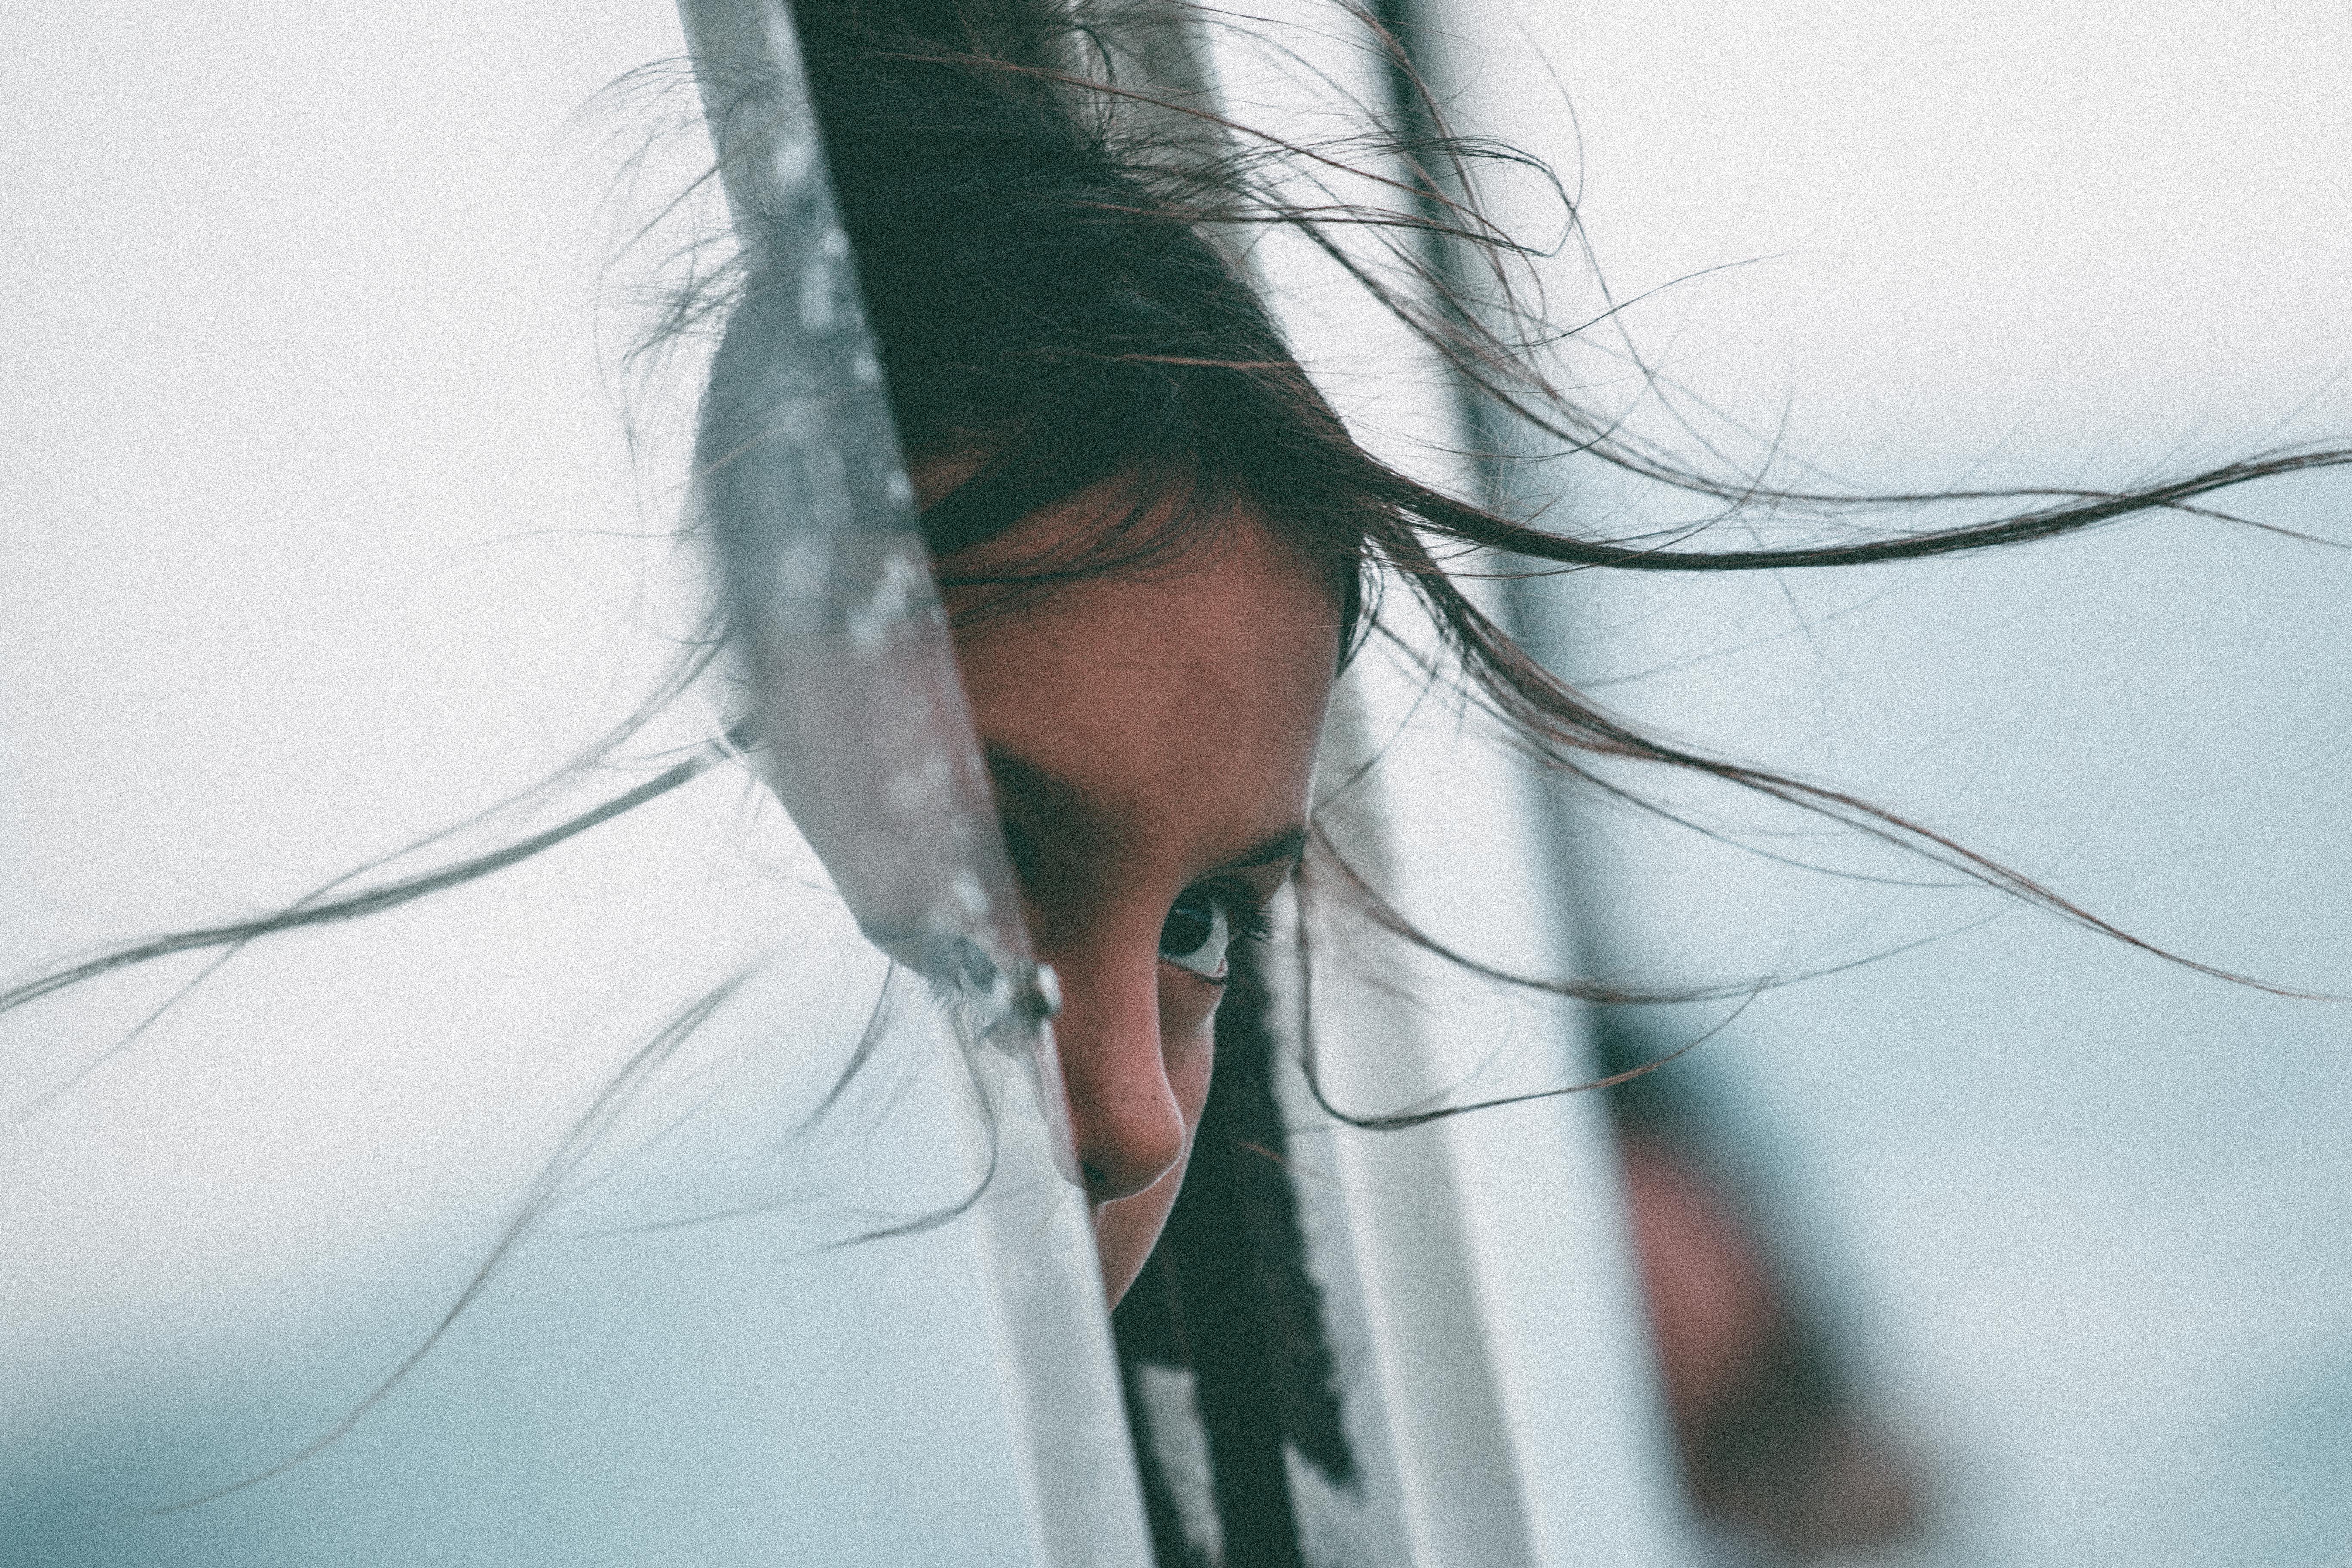 girl sticking her head in car of window